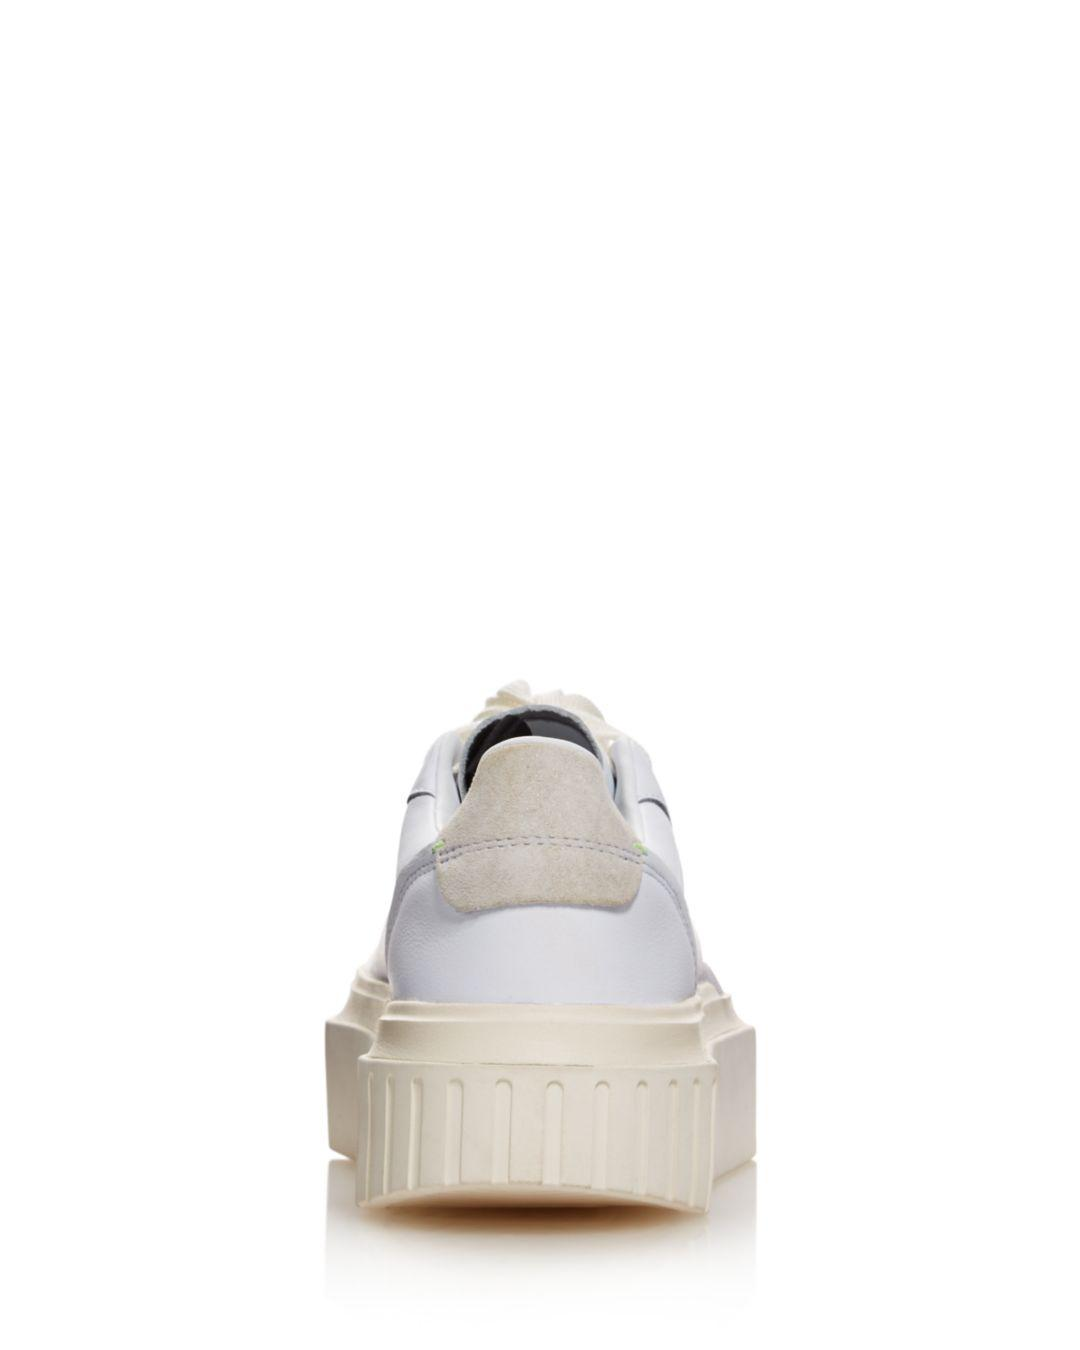 0a5e1c37 Adidas White Hypersleek Leather Platform Sneakers